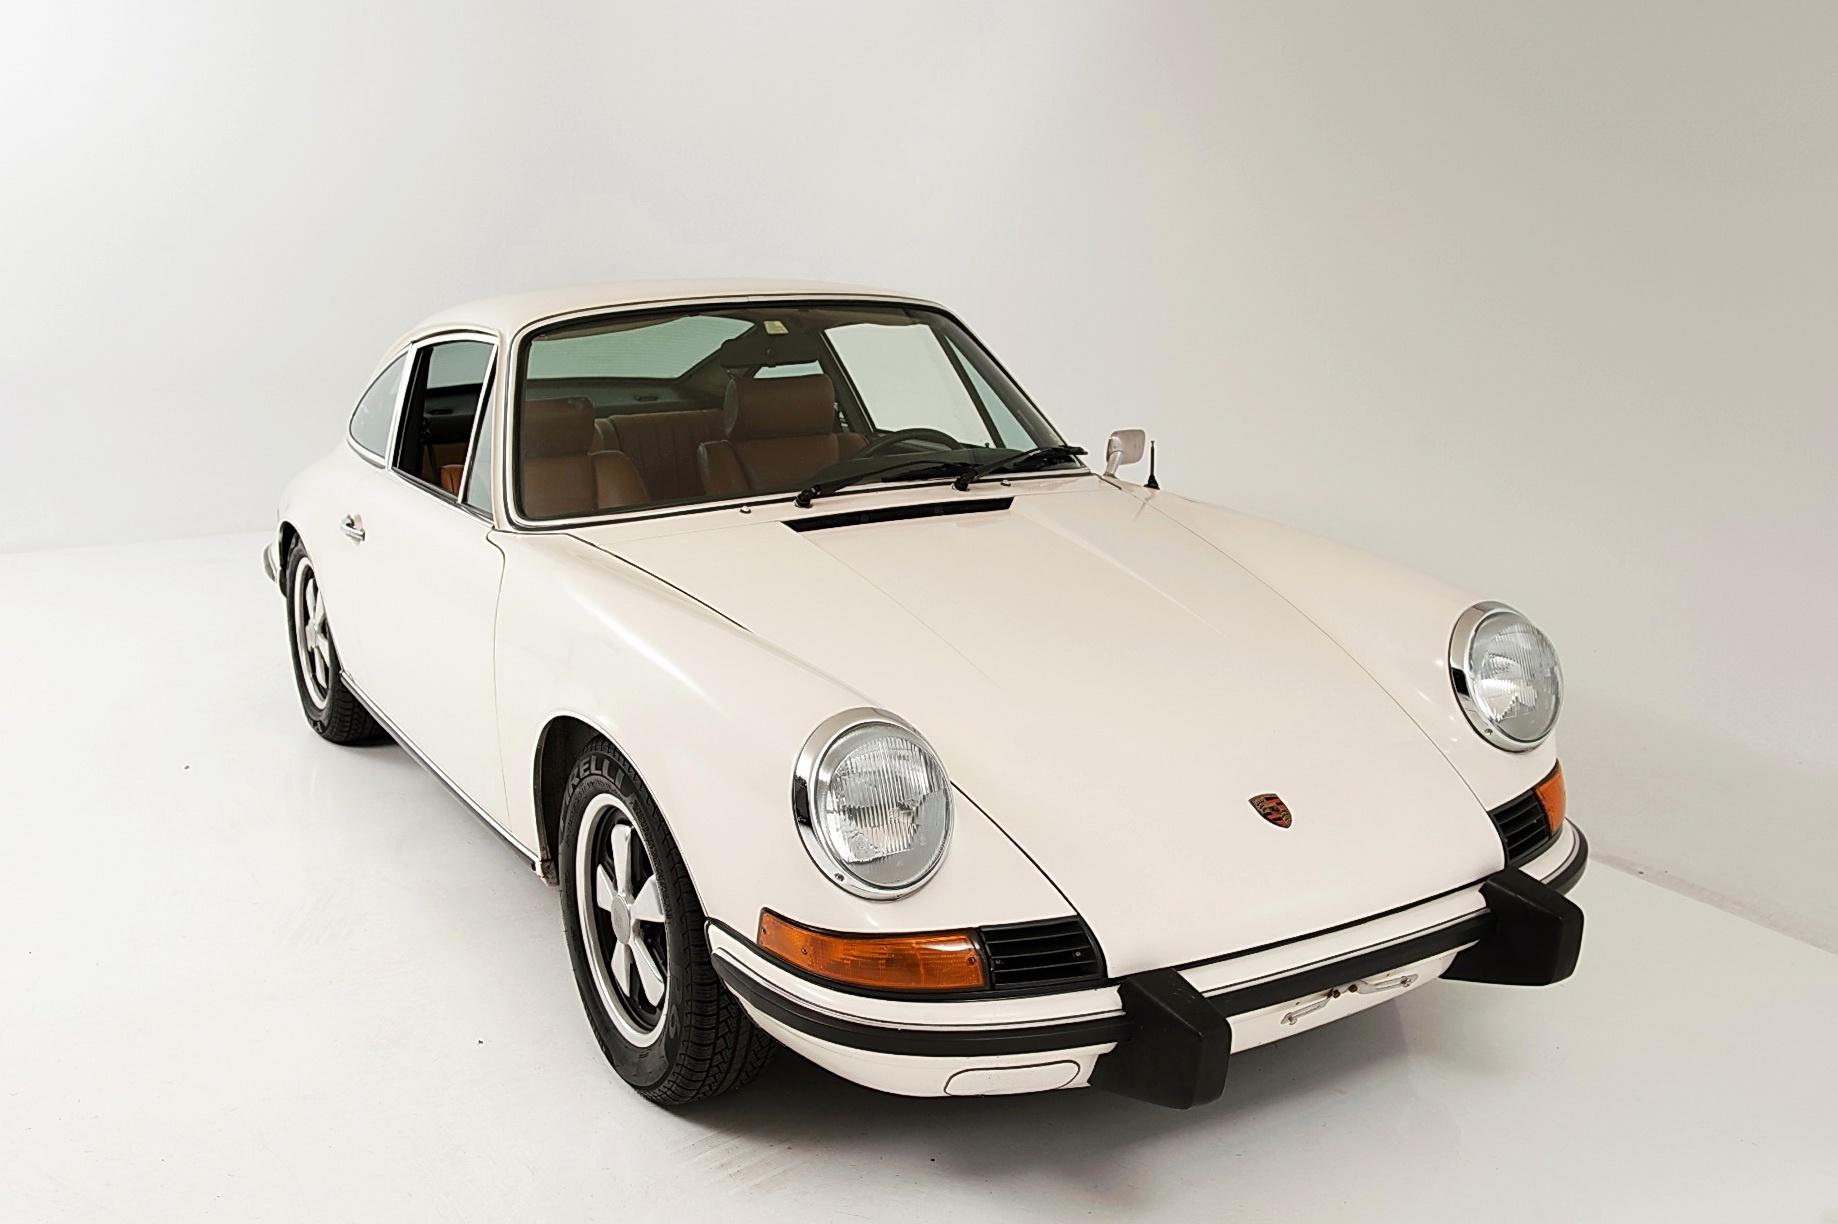 1973 Porsche 911 24 Champion Motors International L Exotic 912 Coupe Type Of Engine